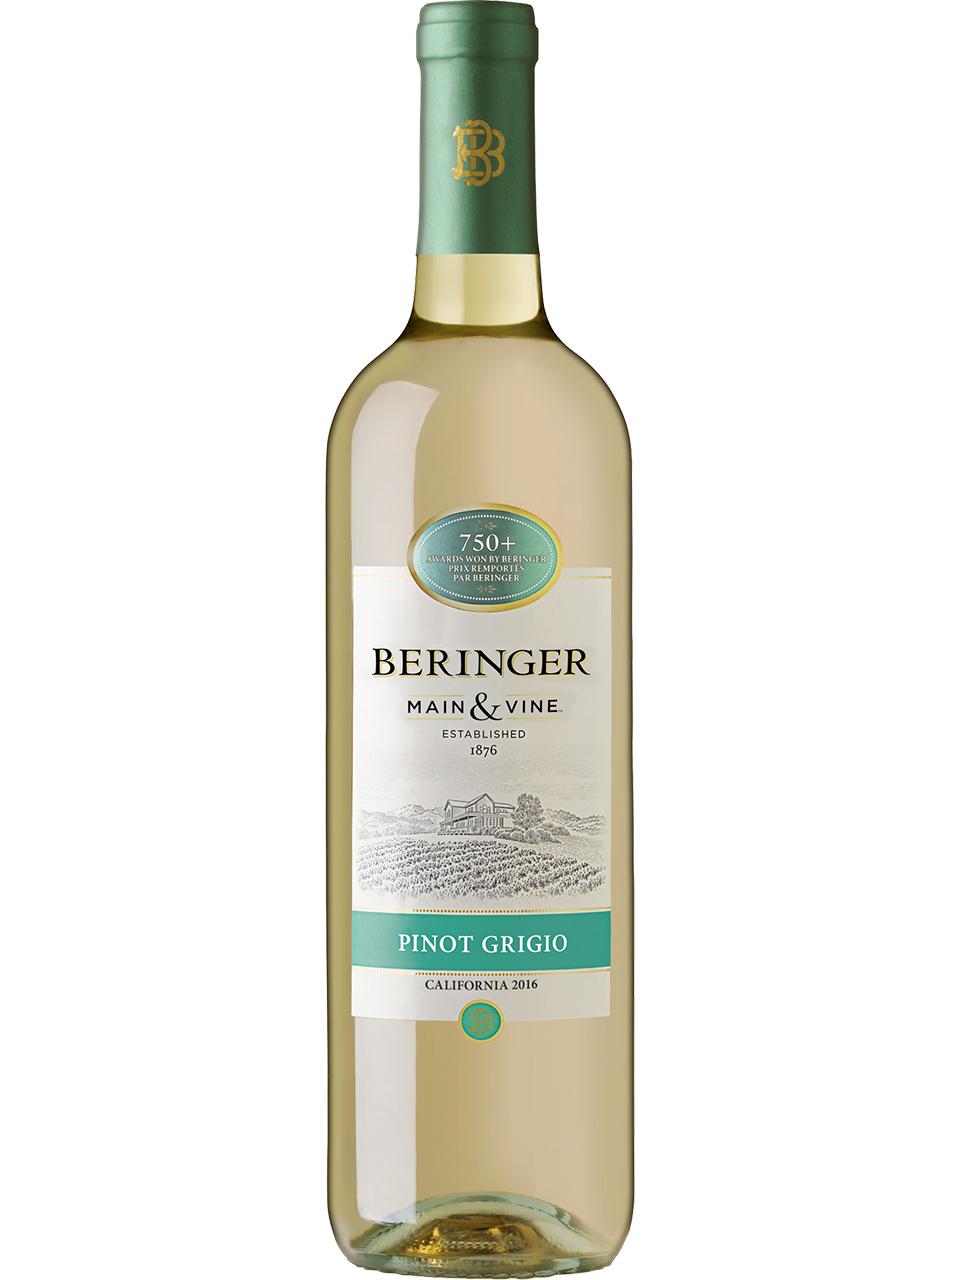 Beringer Main & Vine Pinot Grigio